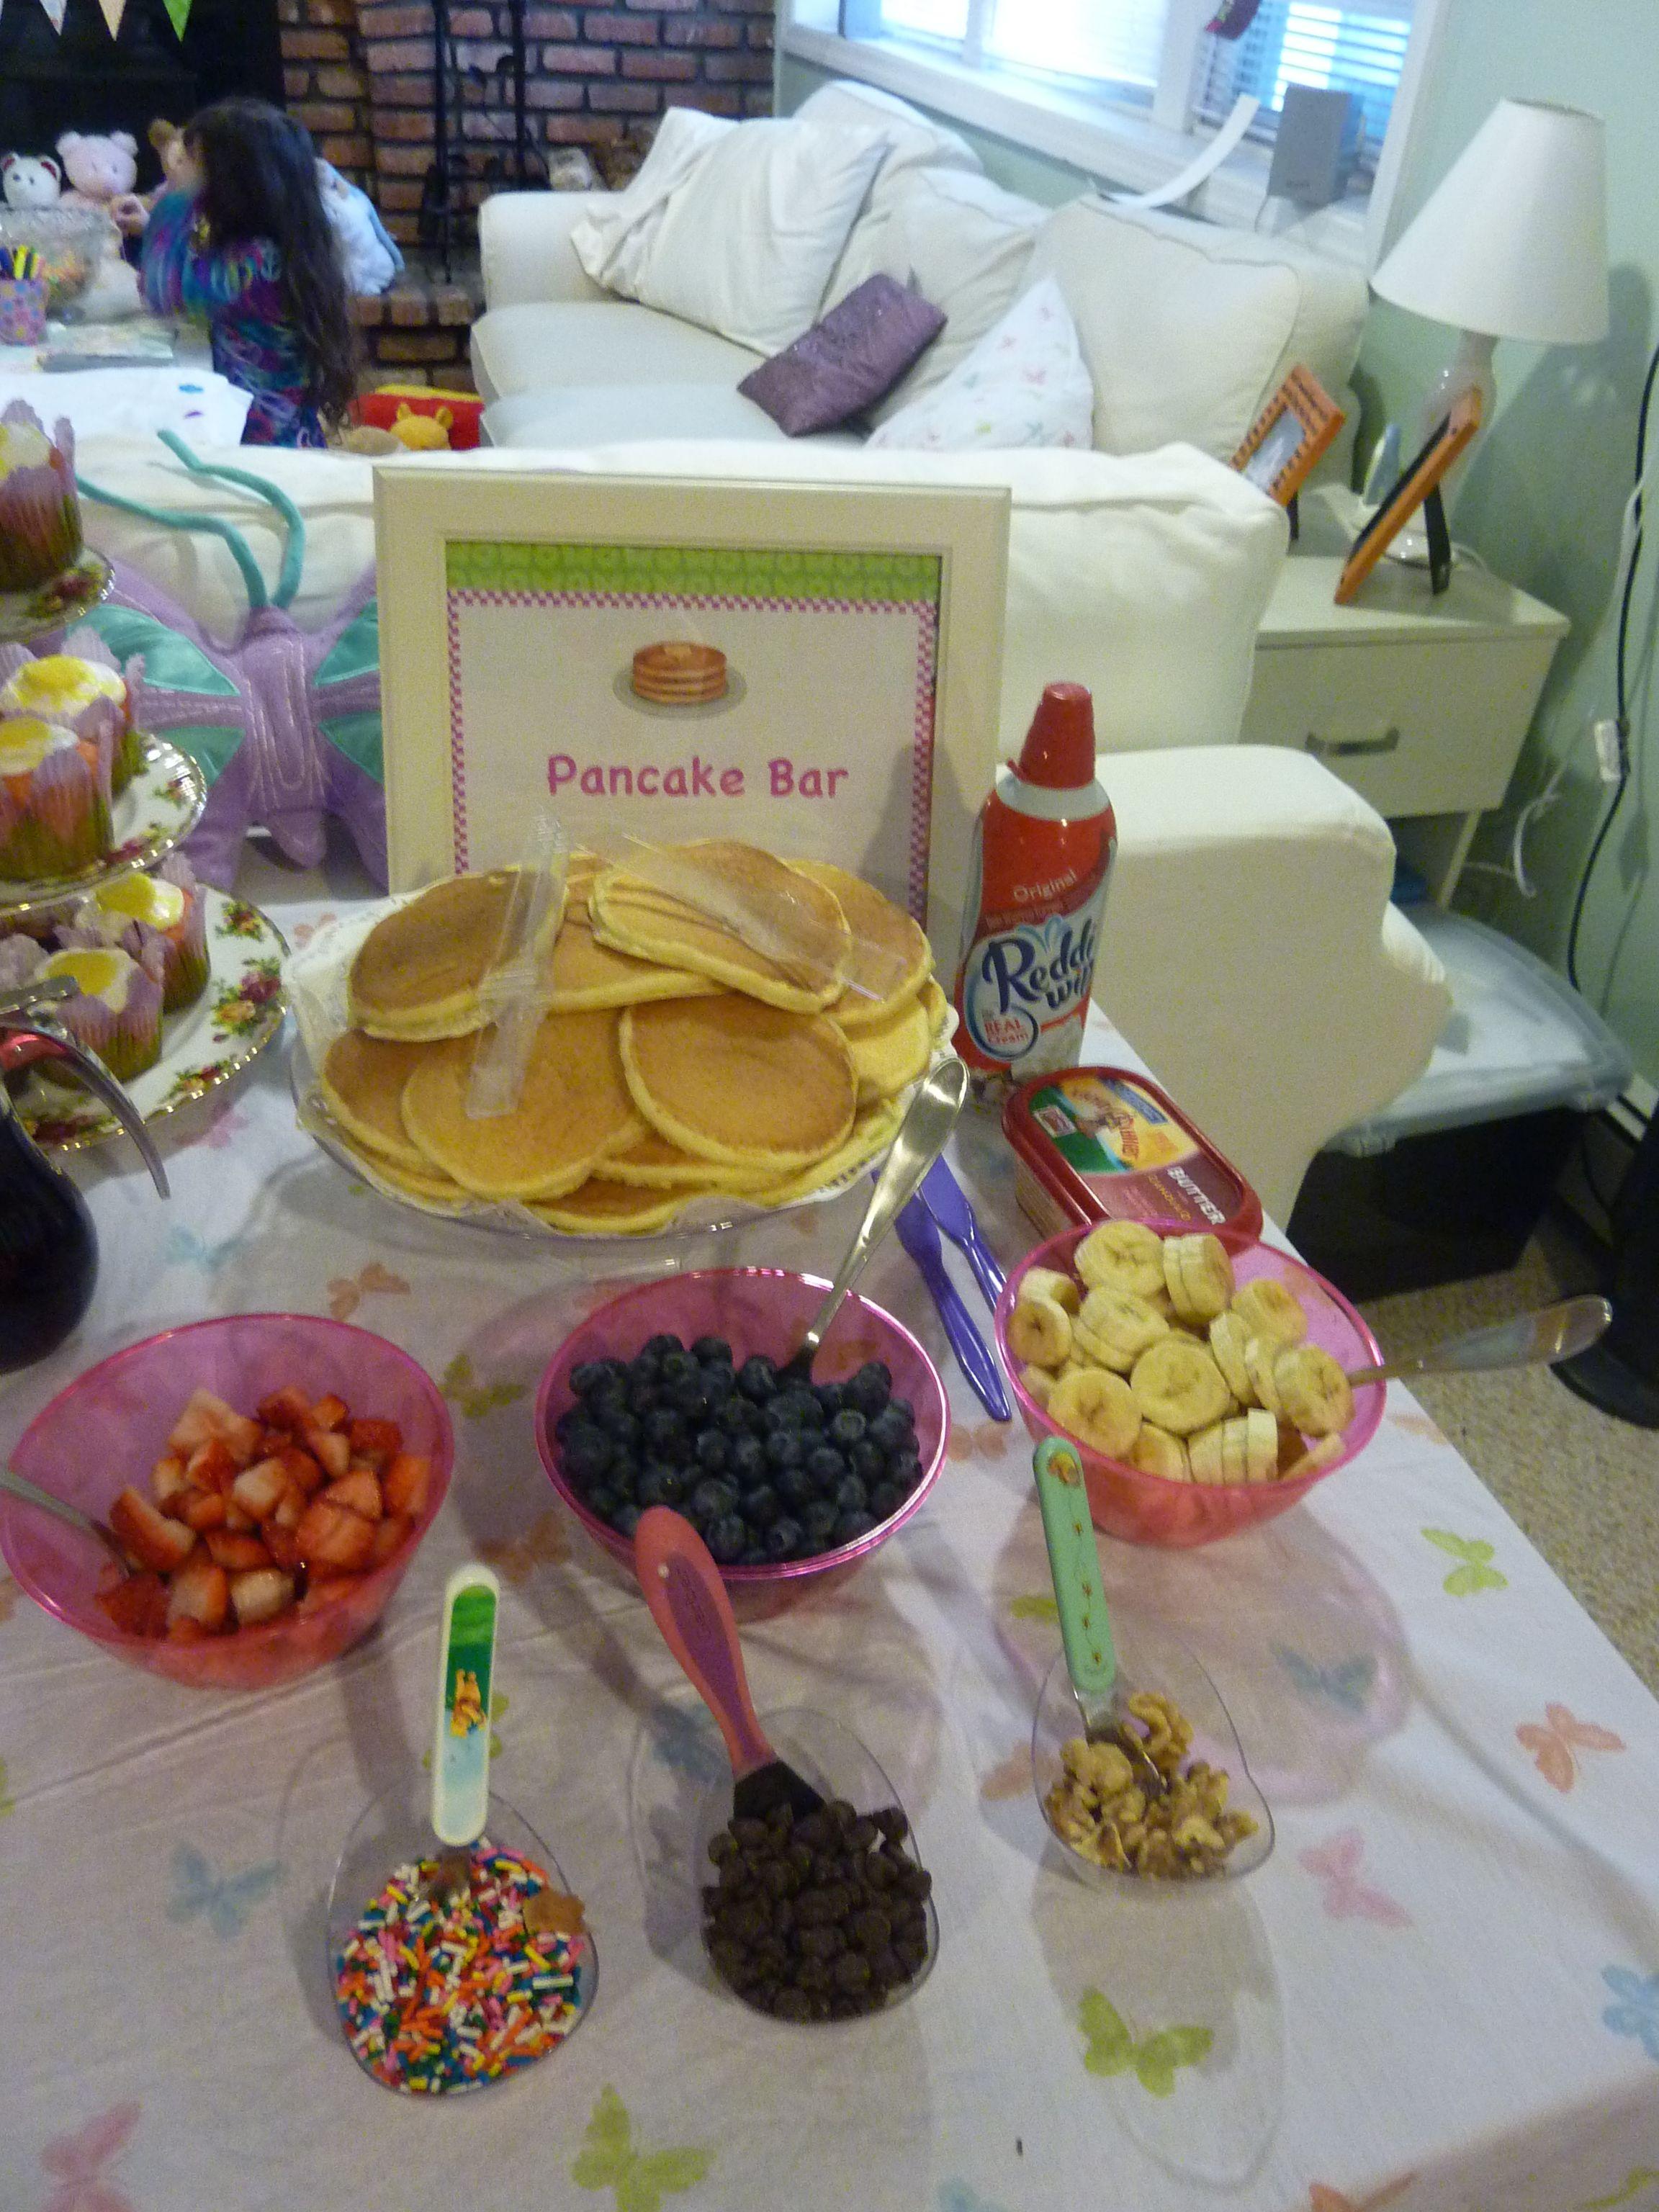 fb0bd90ed2662e6bd3833d3784c1b95e Incroyable De Table Bar Cuisine Conception